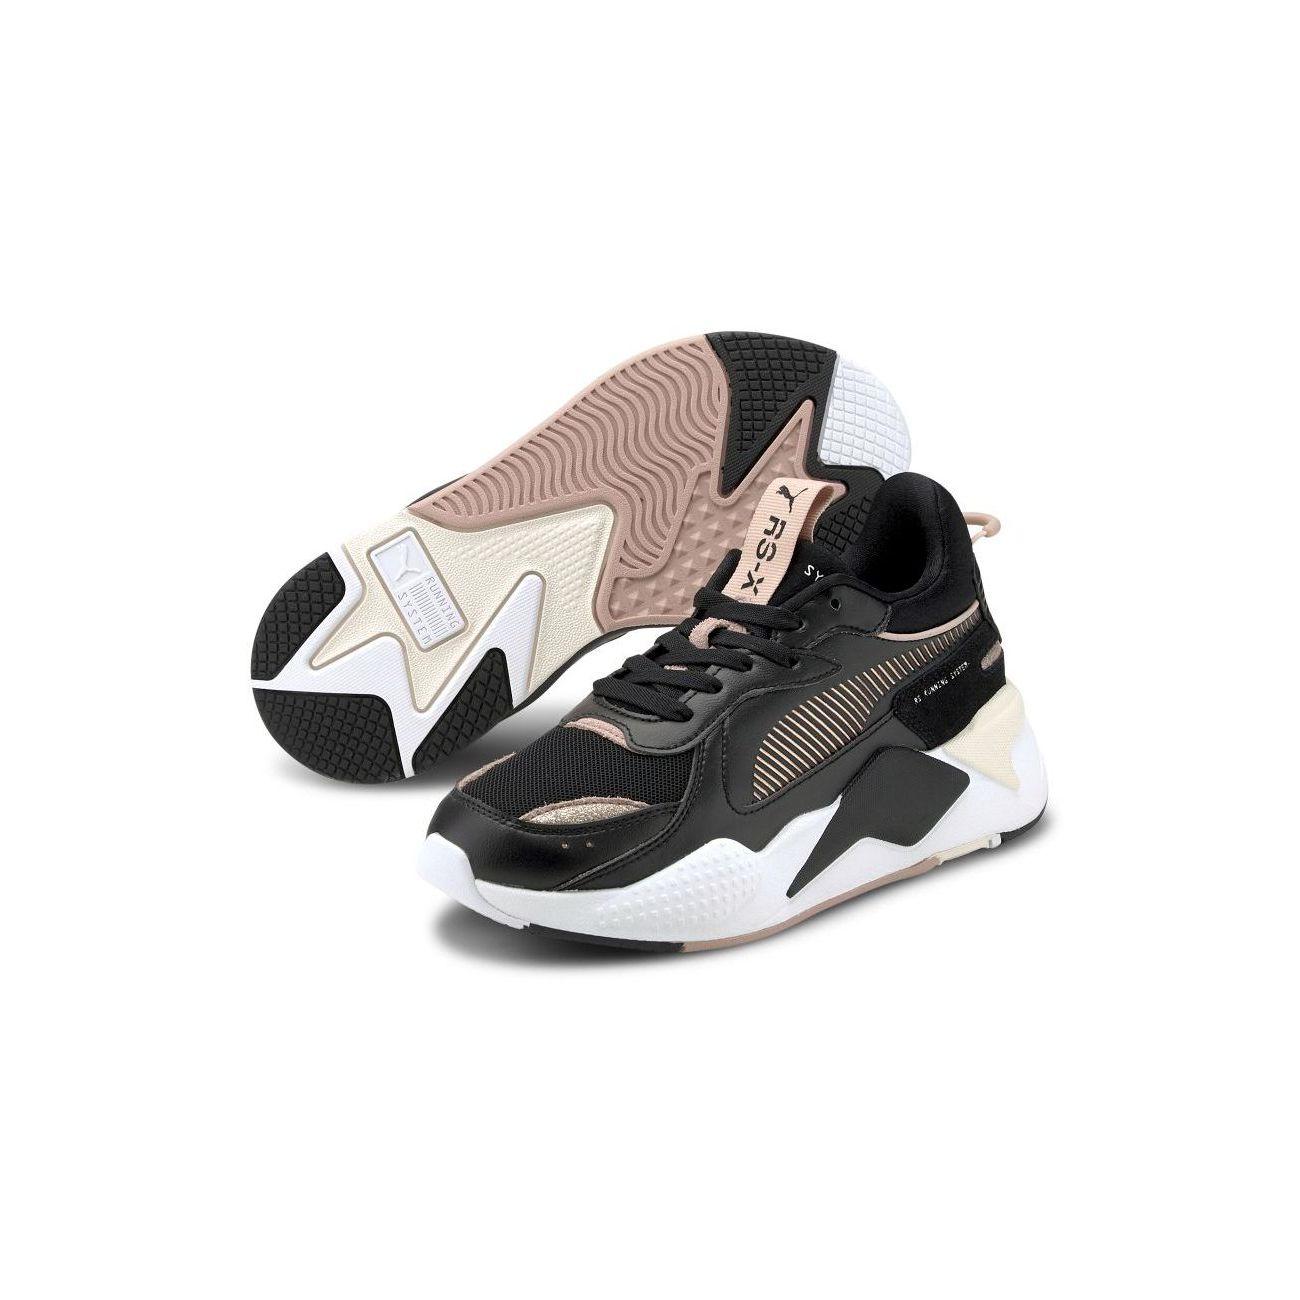 Mode- Lifestyle femme PUMA Baskets RS-X Mono Metal